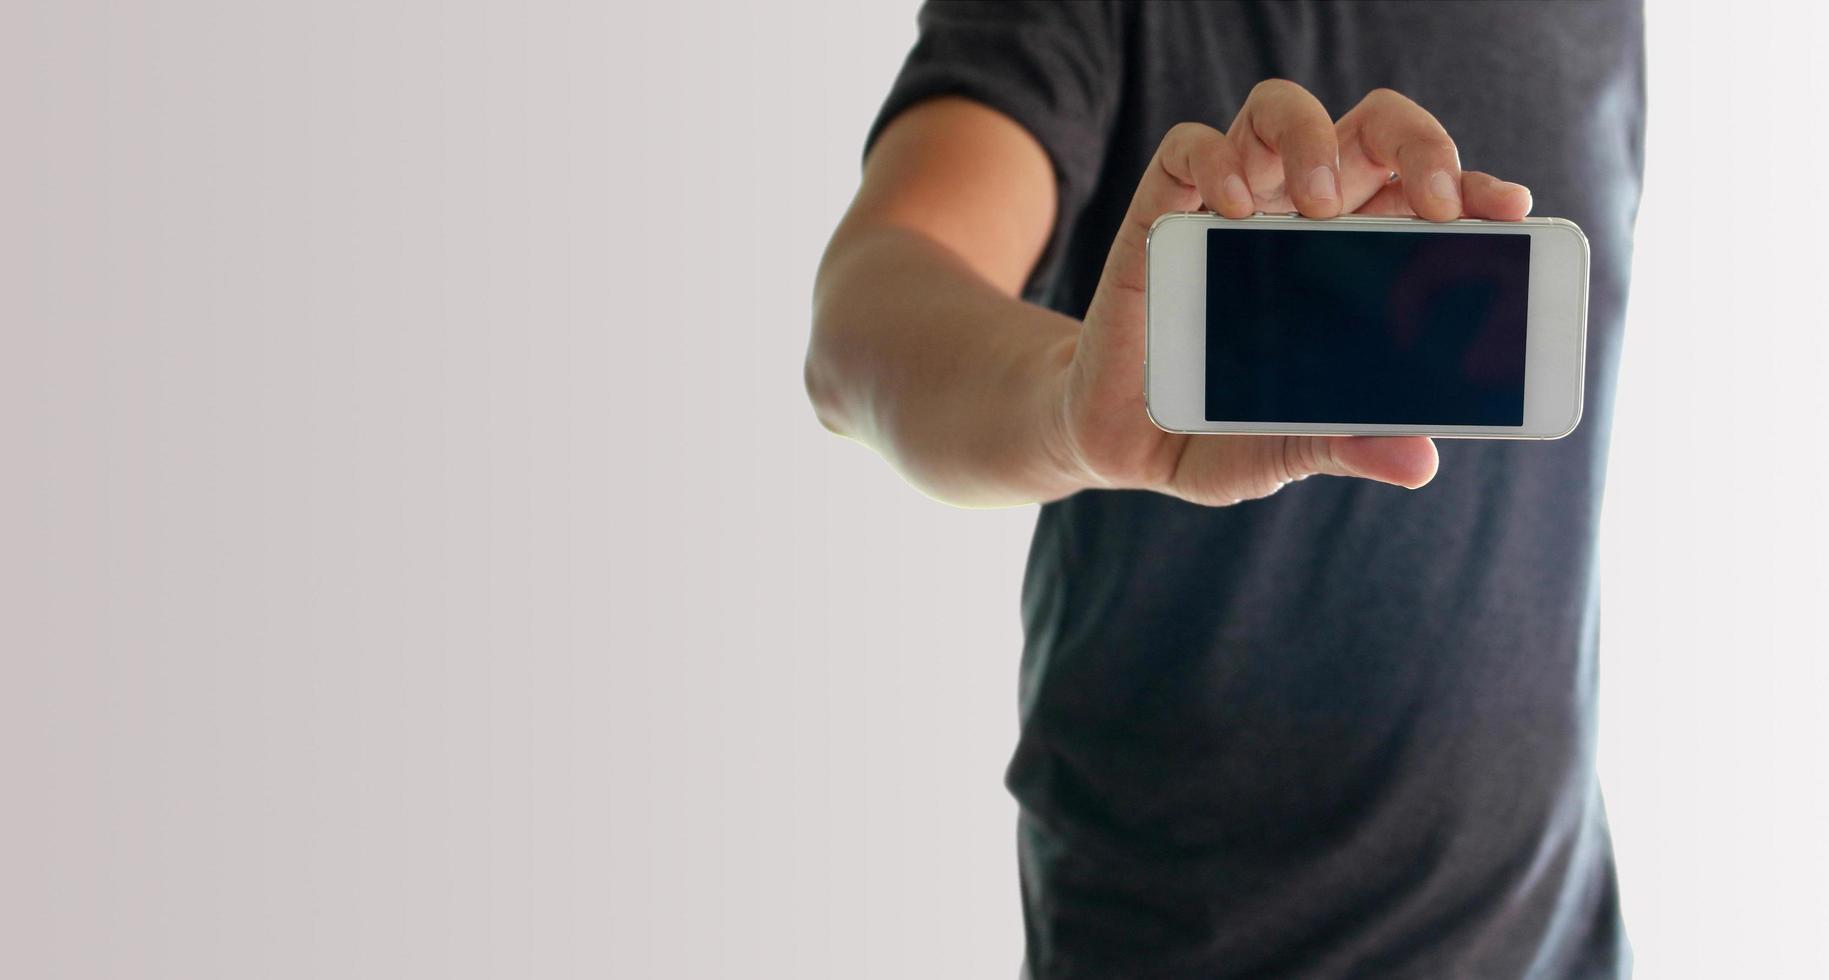 Man showing phone screen photo